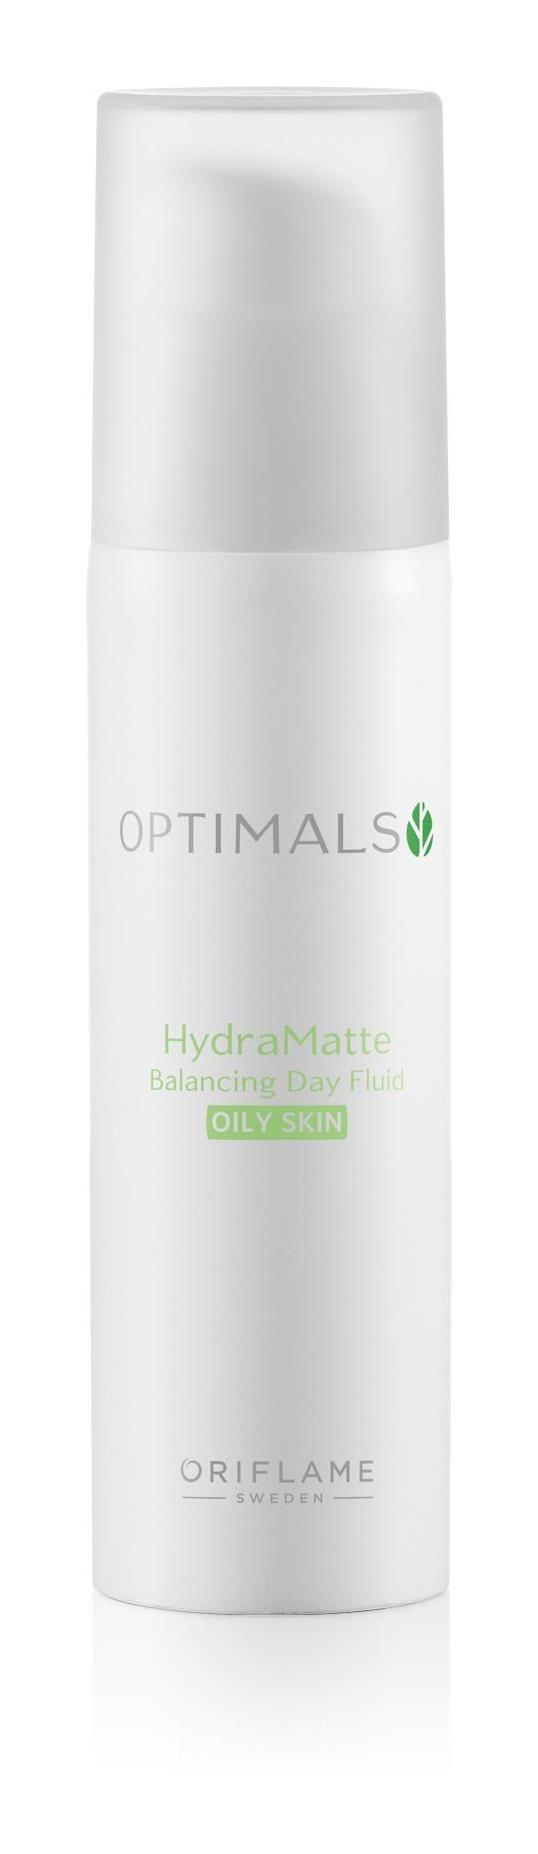 Oriflame Optimals Hydra Matte Balancing Day Fluid